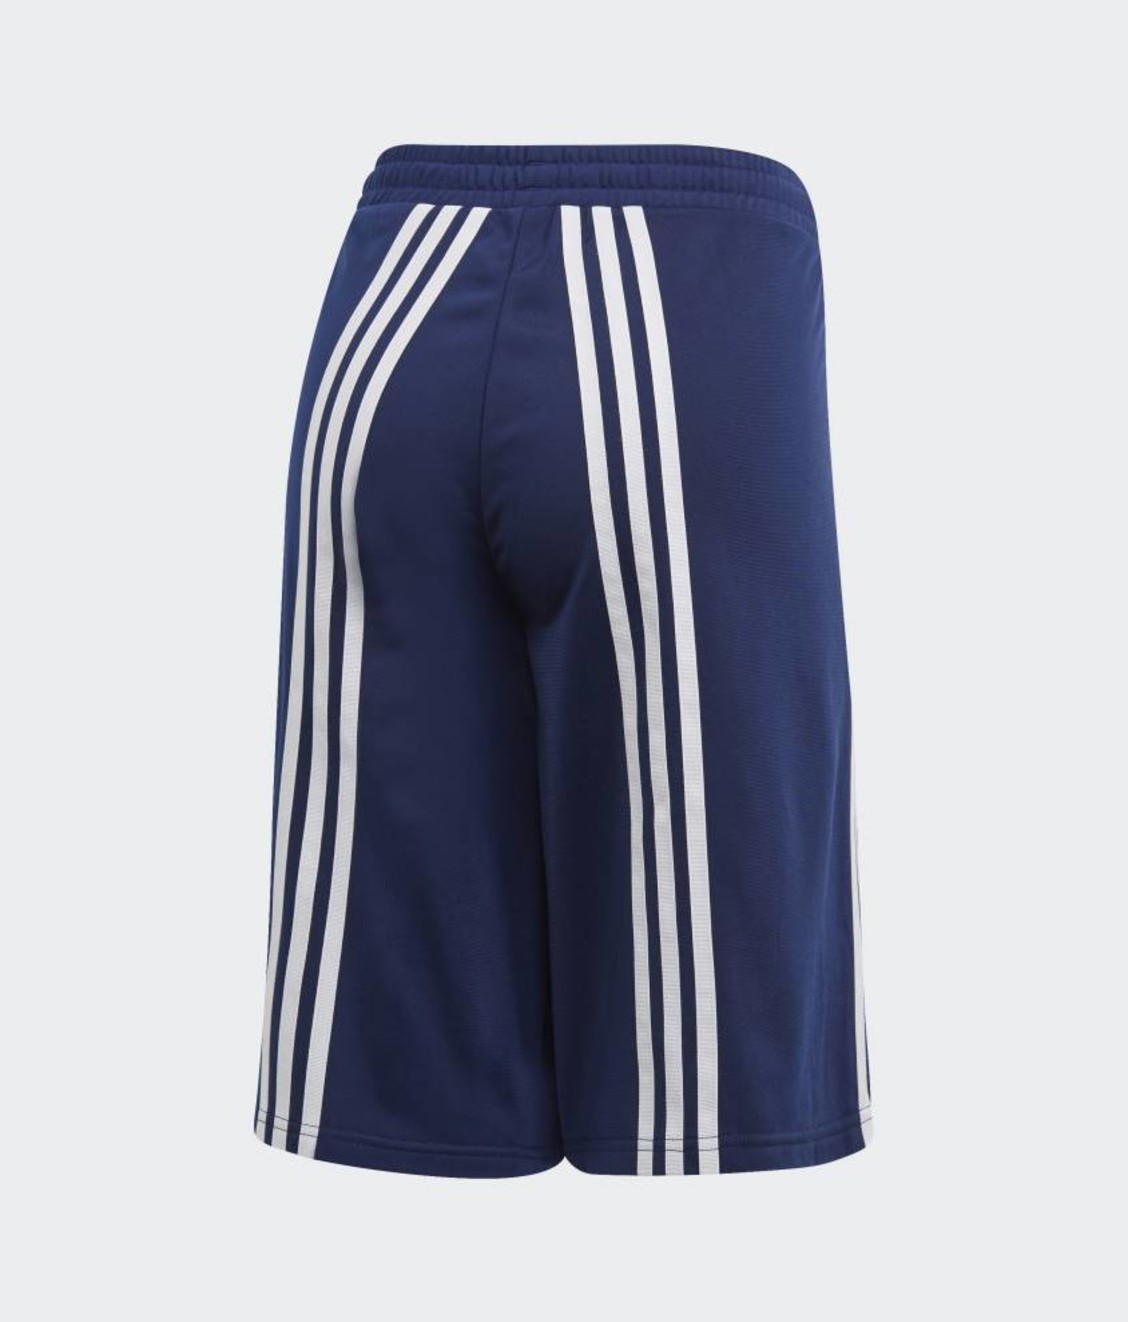 Adidas Adidas X Ji Won Choi Shorts Dark Blue